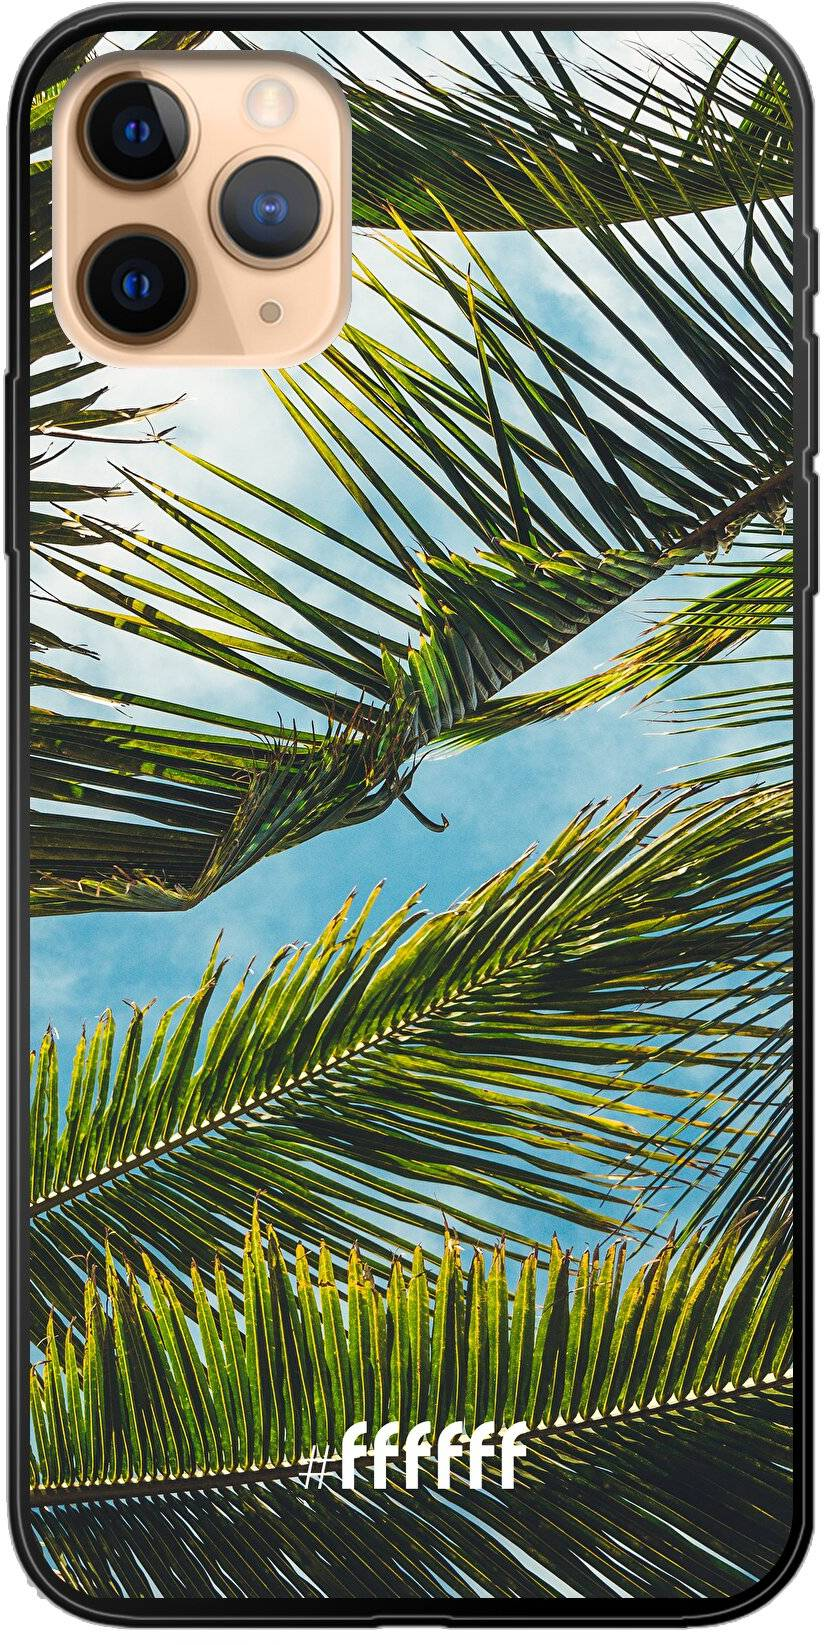 Palms iPhone 11 Pro Max